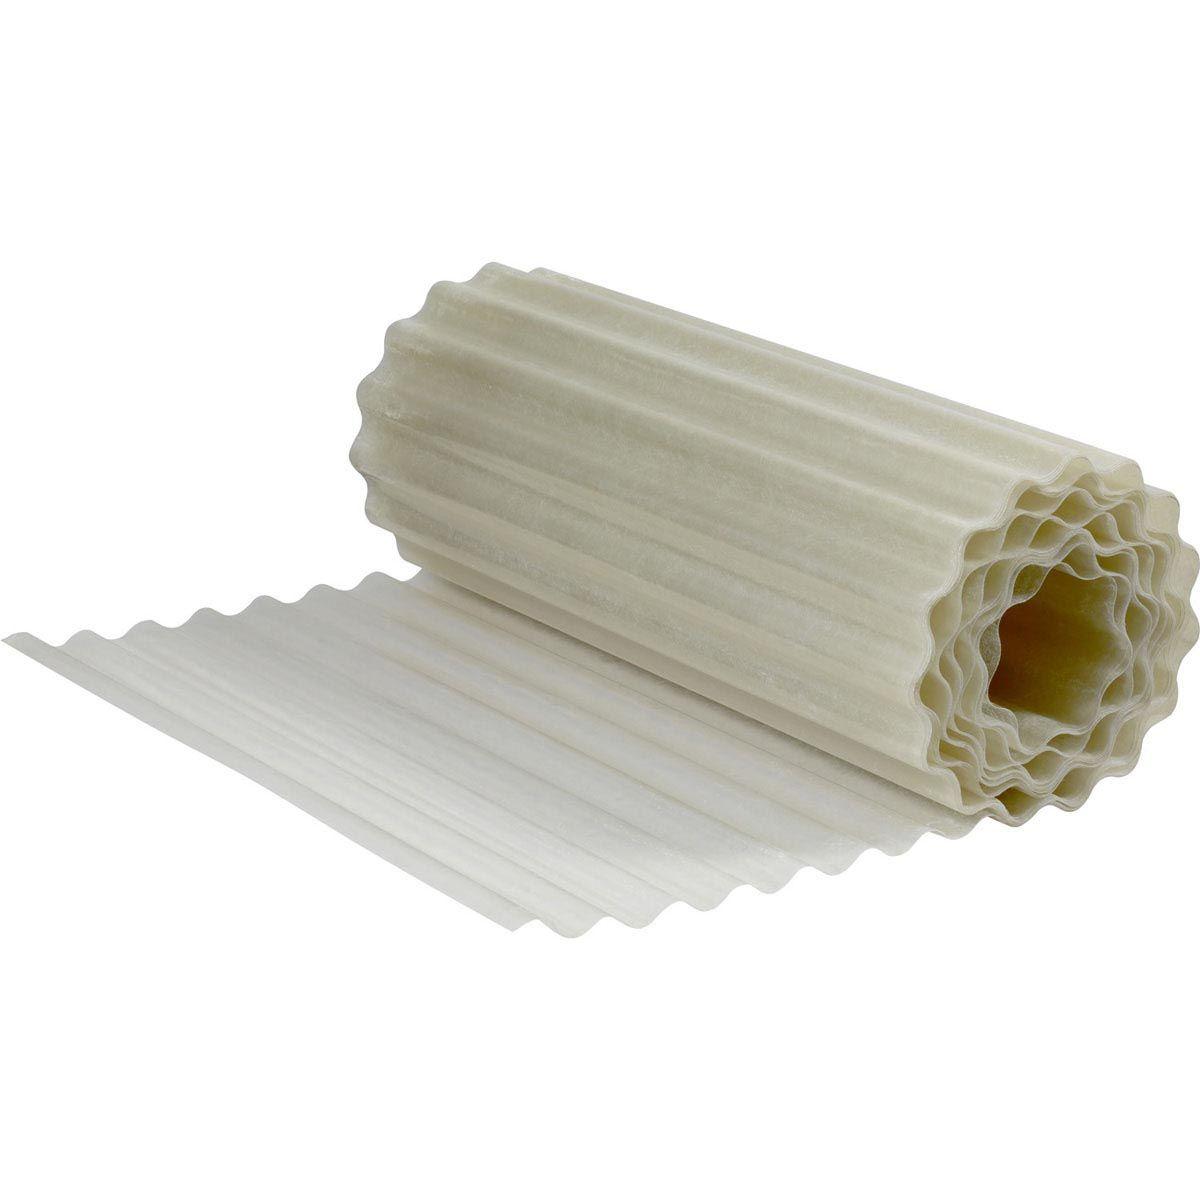 Wellplatte, aus PES, farblos, 20000 x 1000 x 1 mm